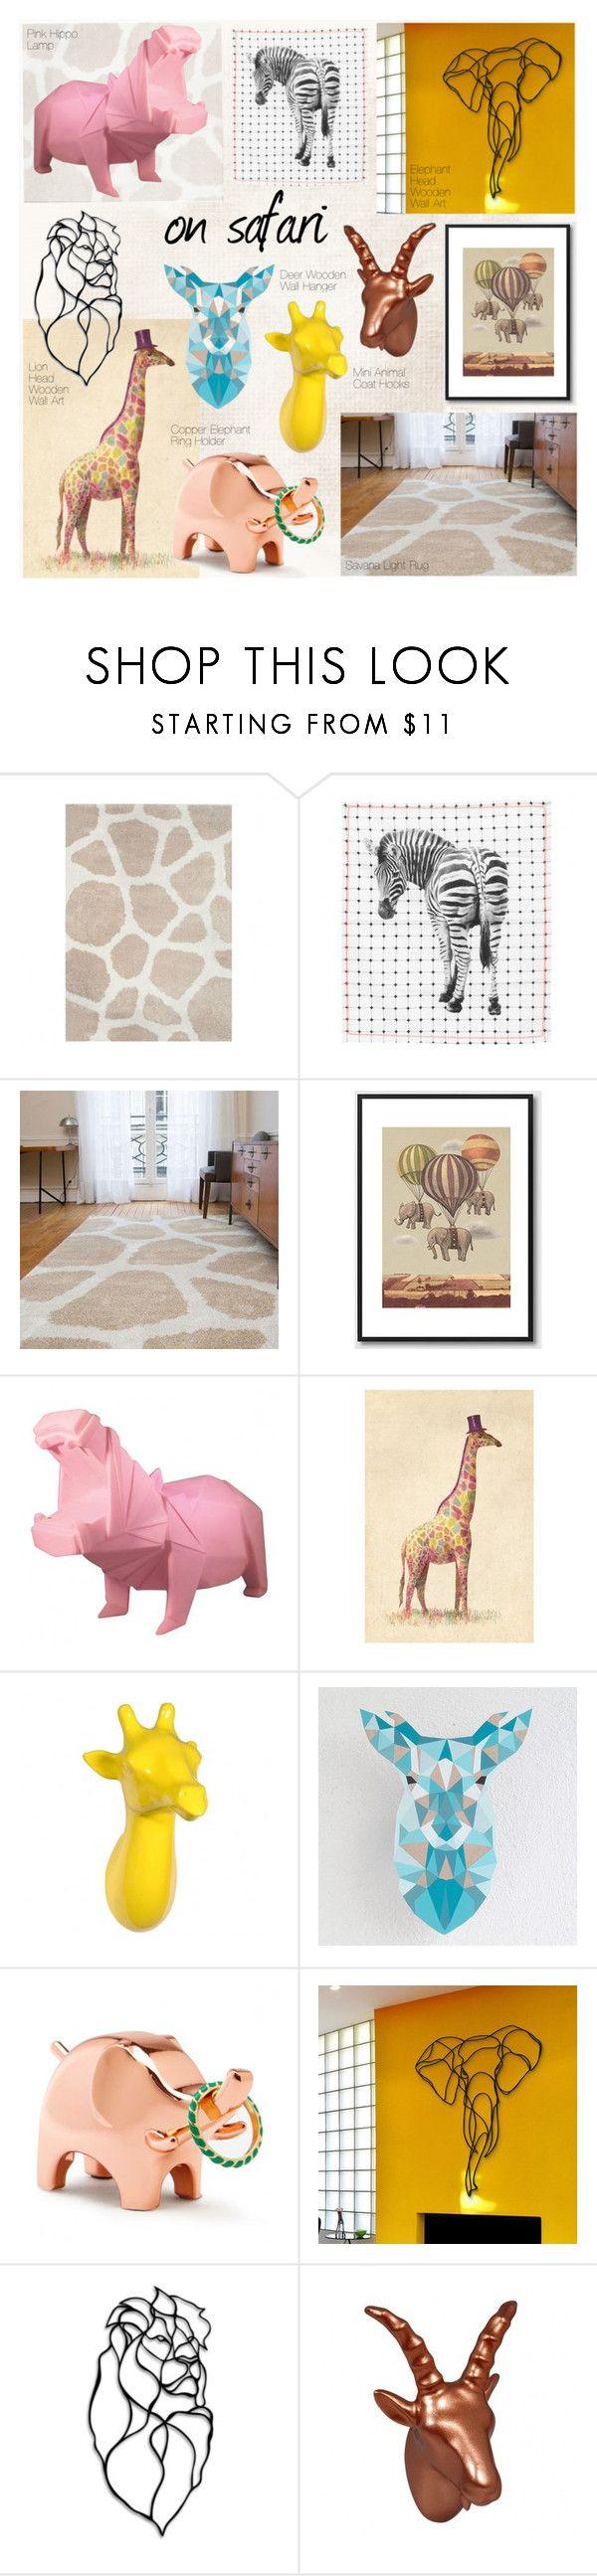 17 Best Ideas About Safari Home Decor On Pinterest